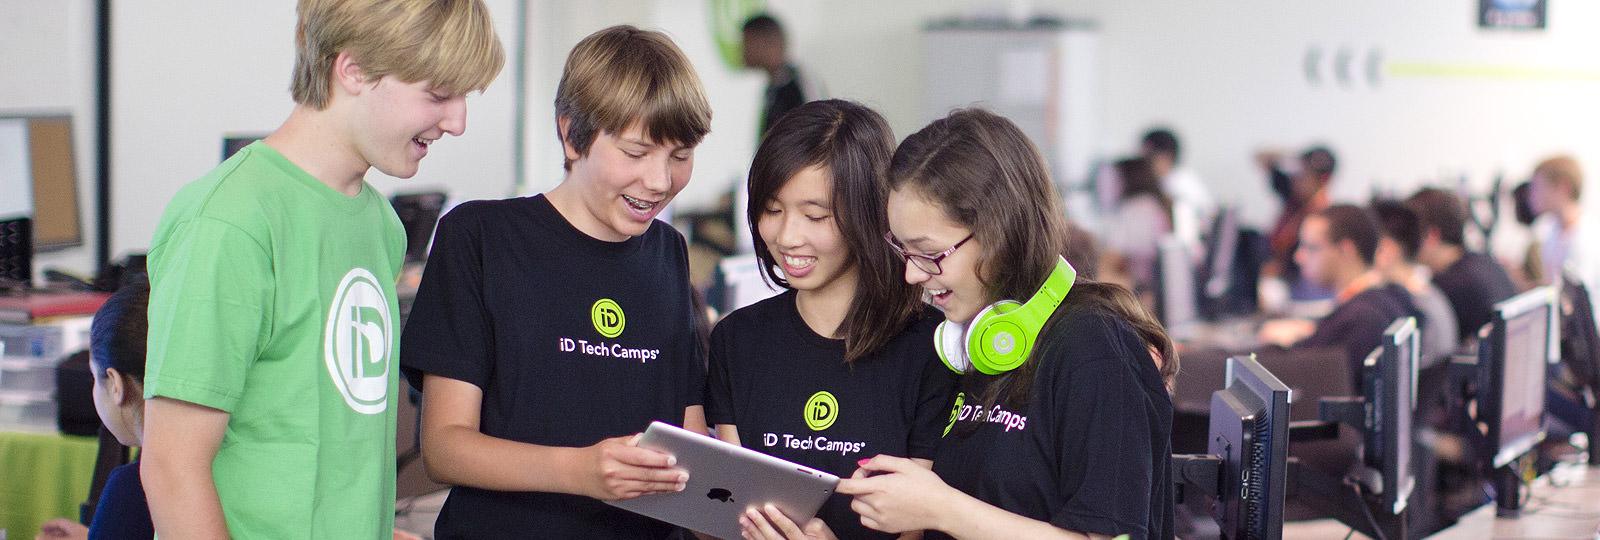 8 Innovative Student STEM Destinations